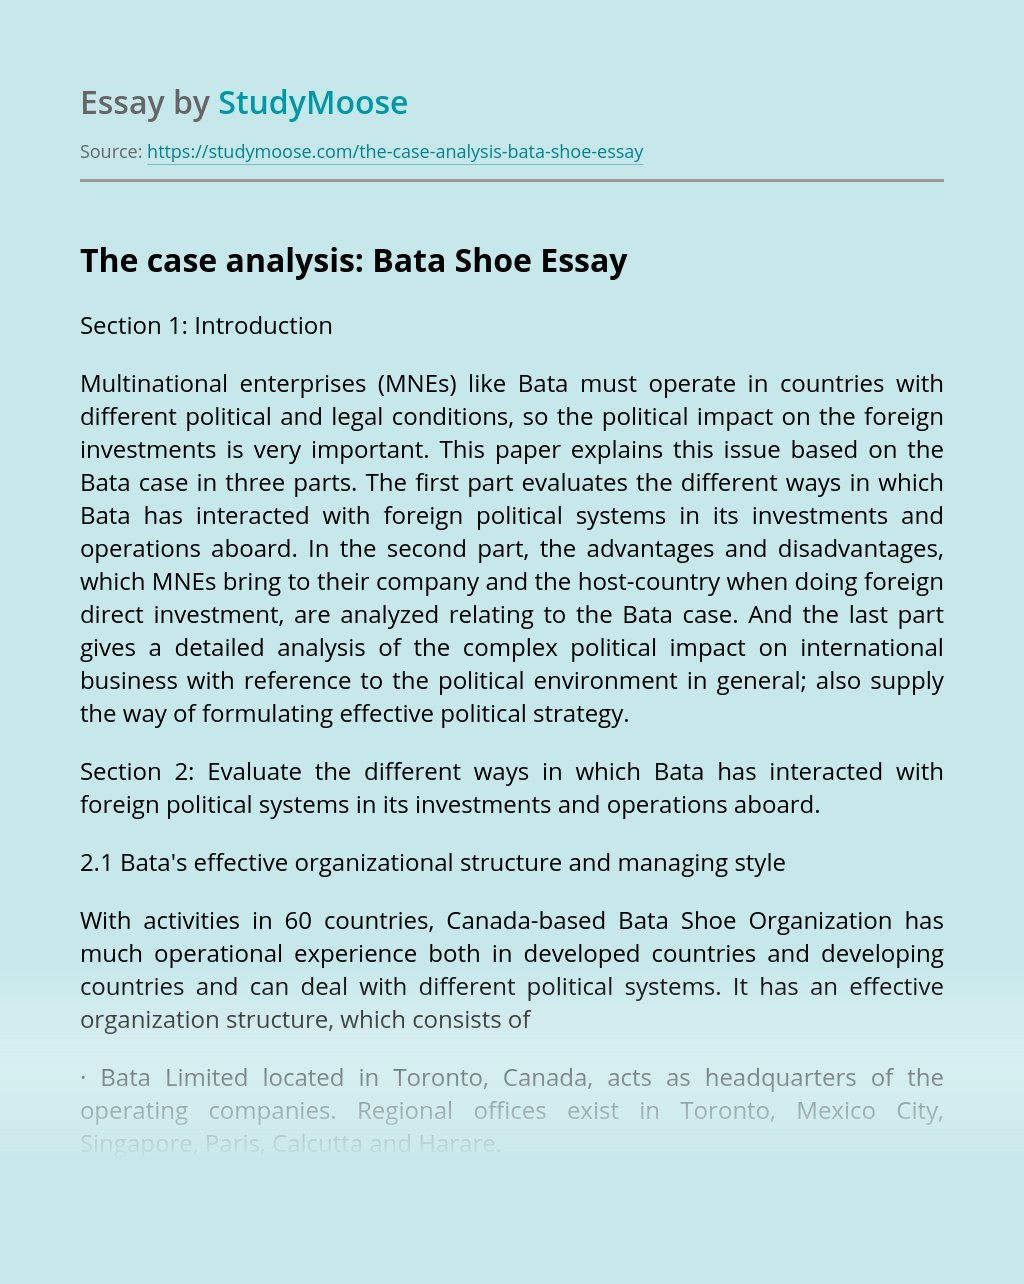 The case analysis: Bata Shoe